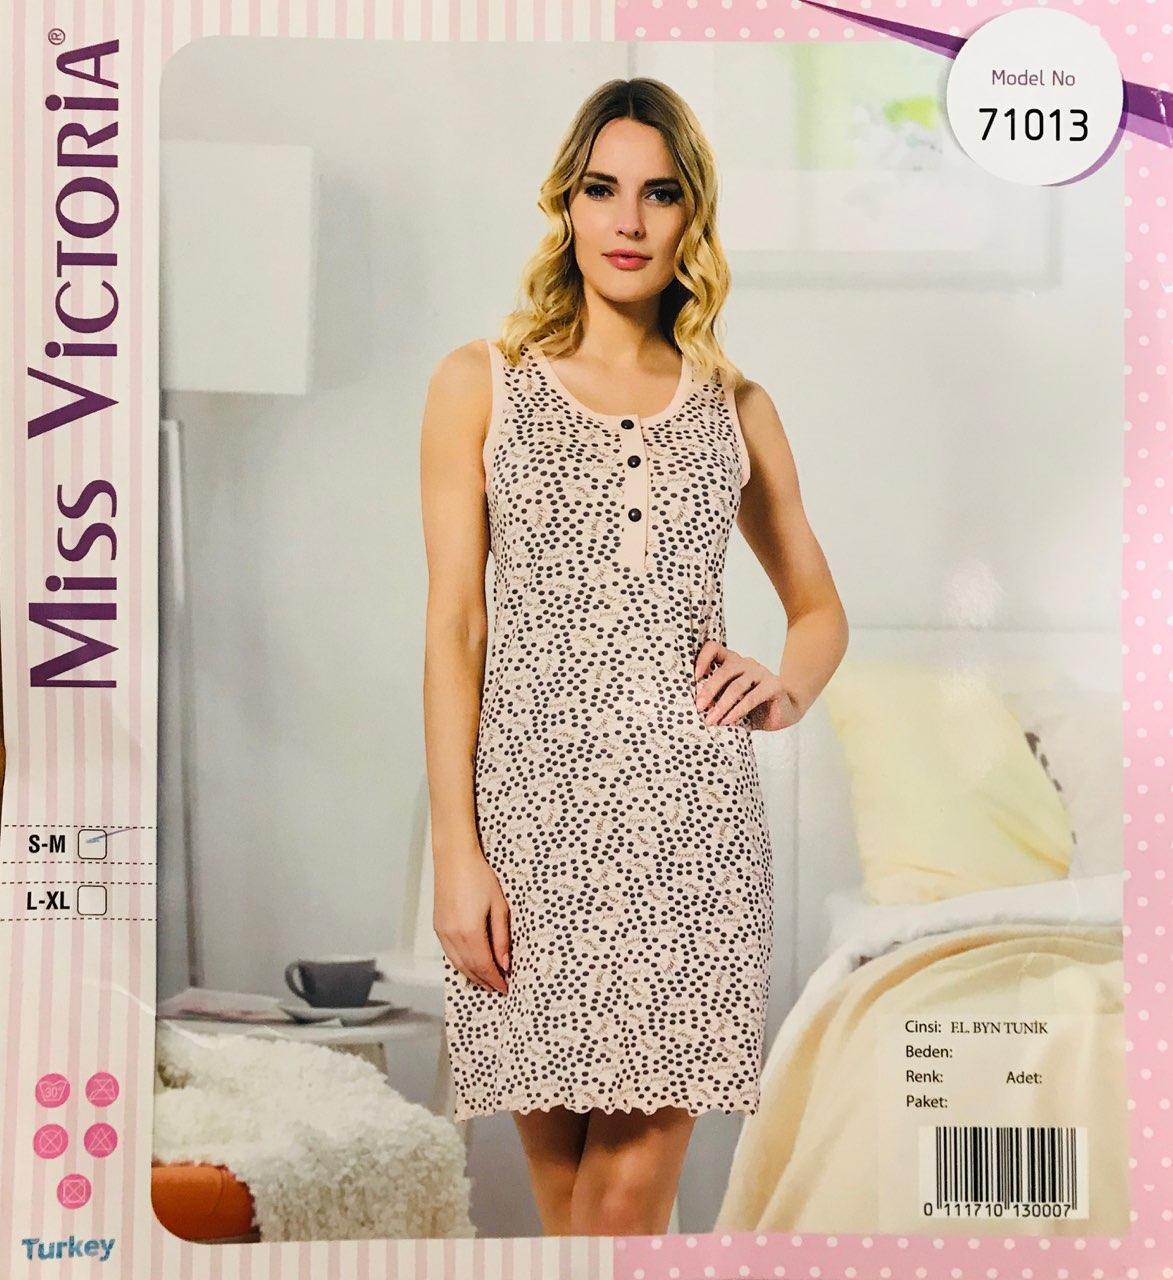 Женская пижама хлопок Miss Victoria Турция размер S-M(44-46) 71013